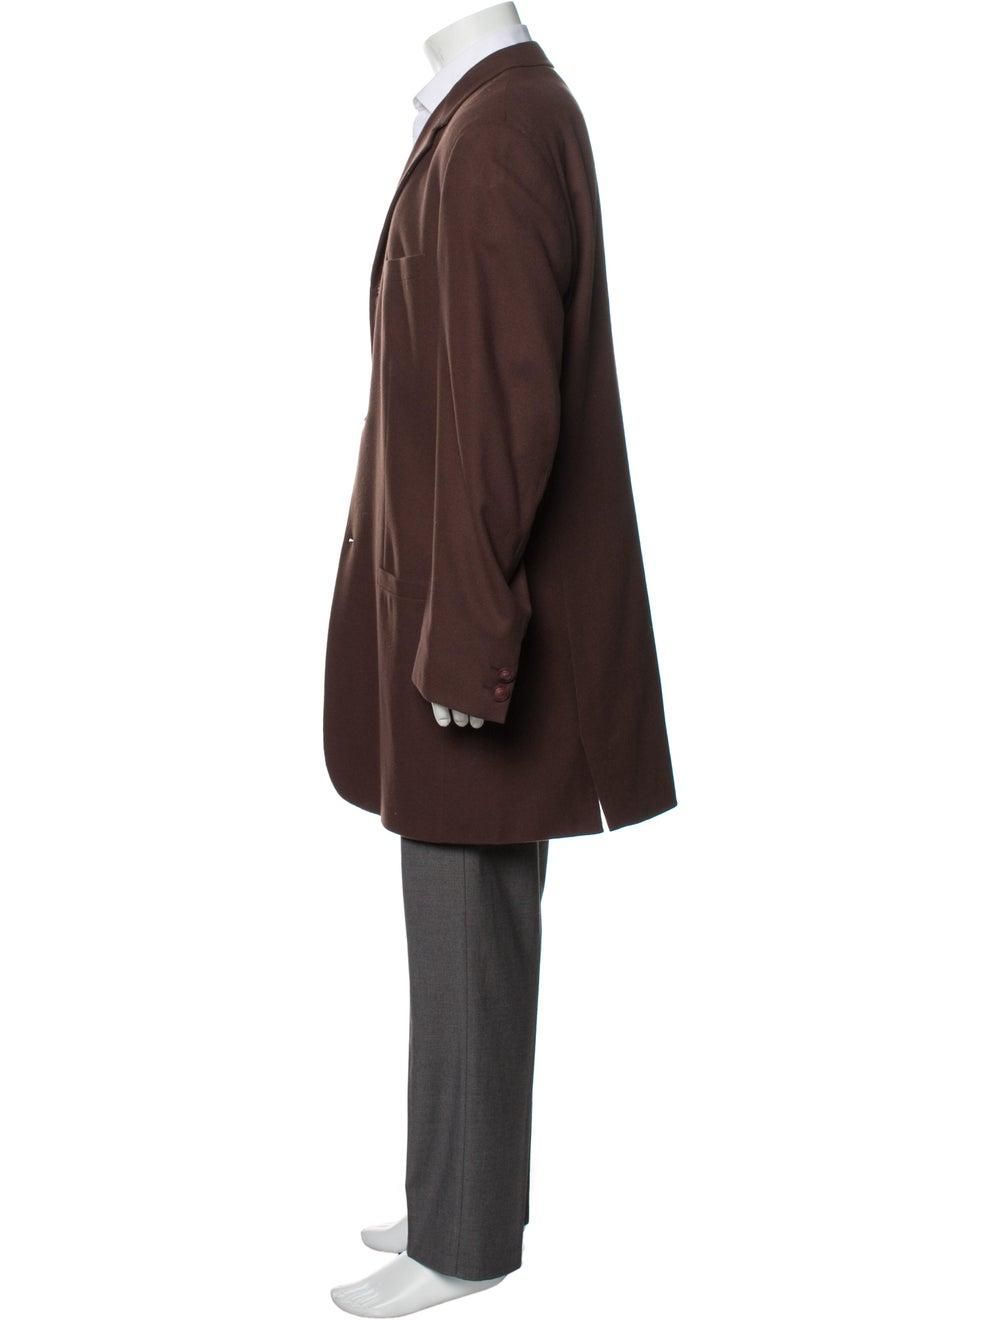 Gianni Versace Vintage Overcoat Brown - image 2